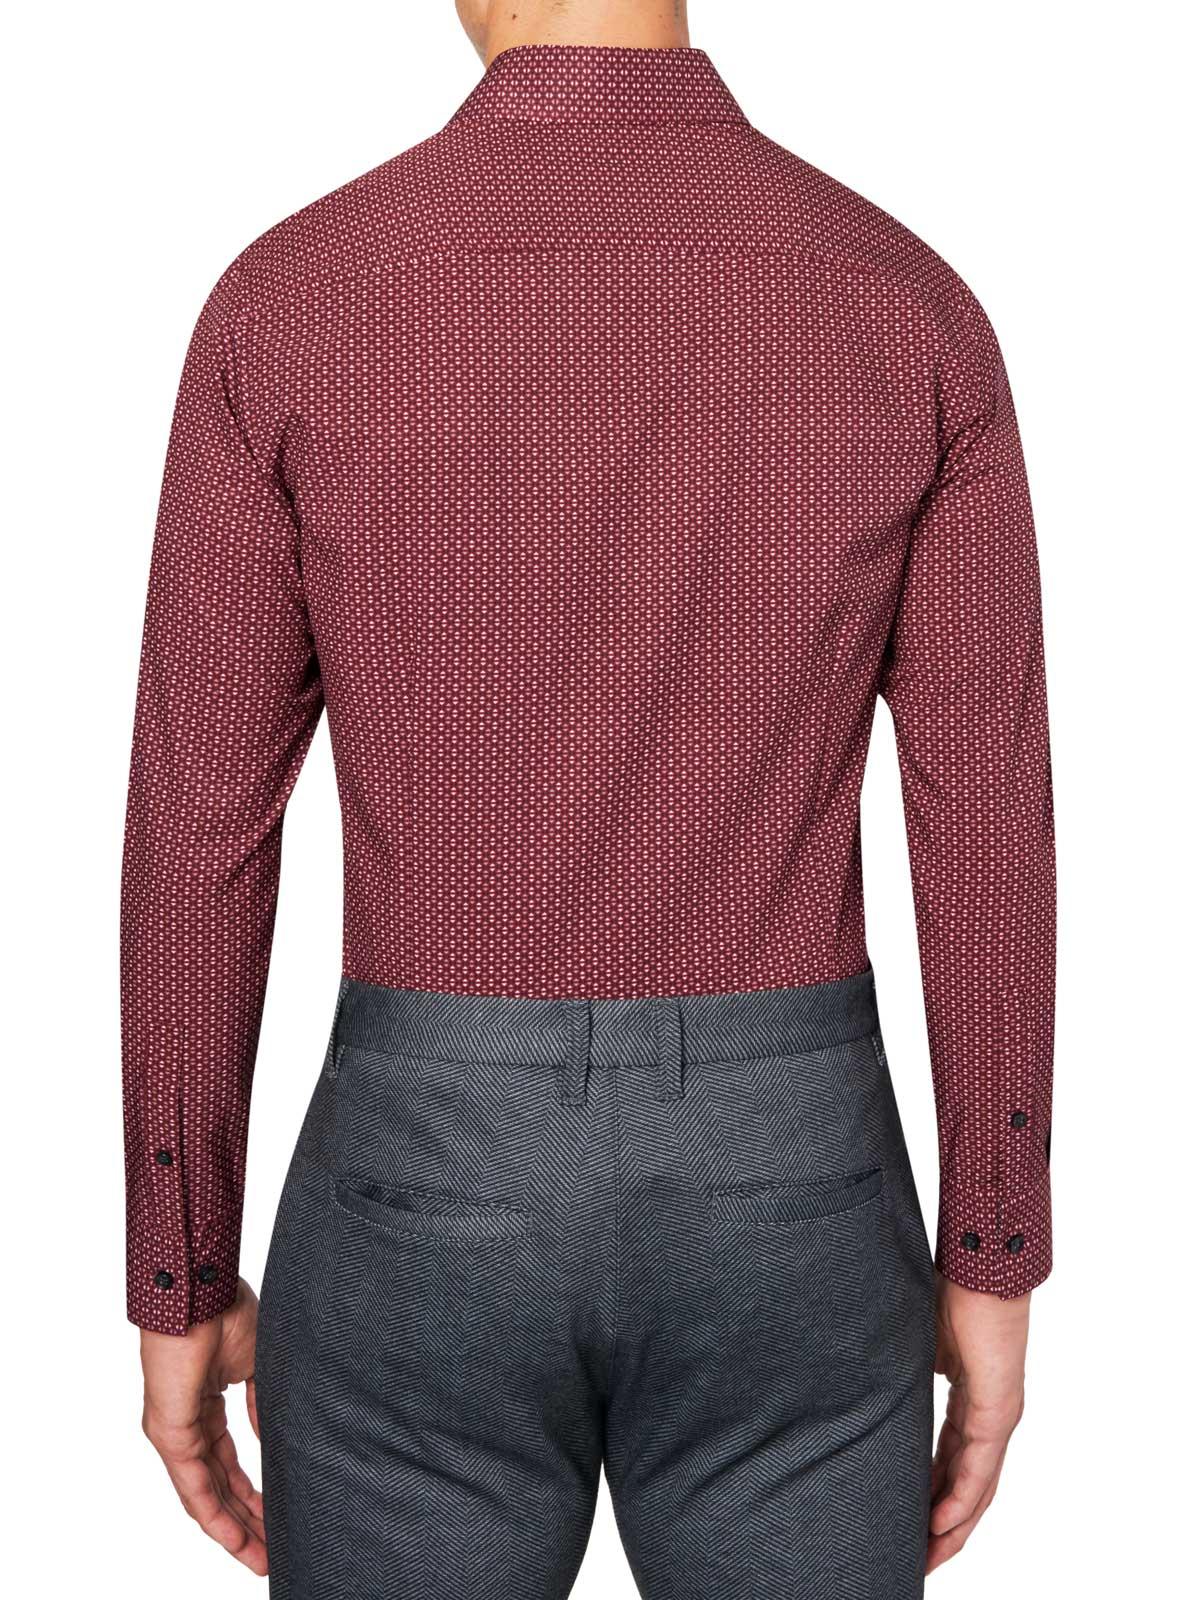 MINI GEO PRINT COOLING PERFORMANCE STRETCH DRESS SHIRT